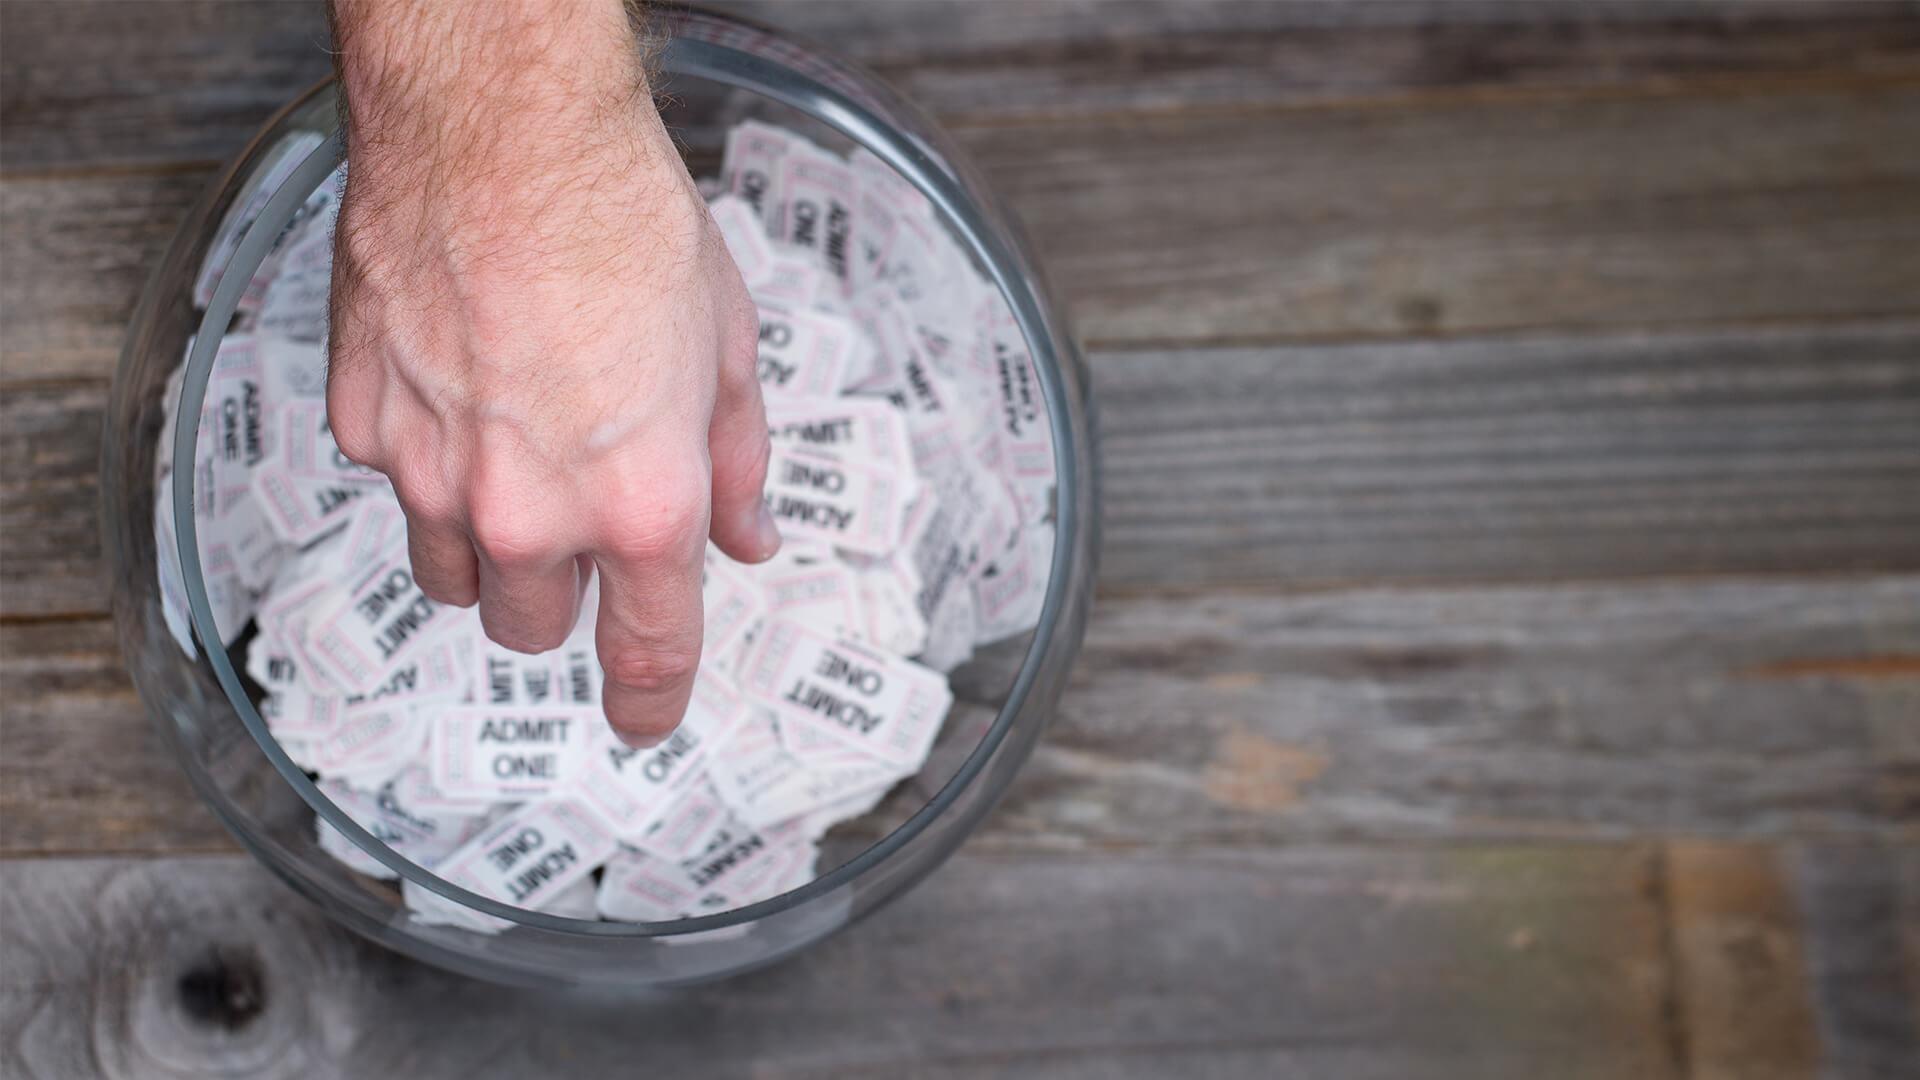 Postcode lotto